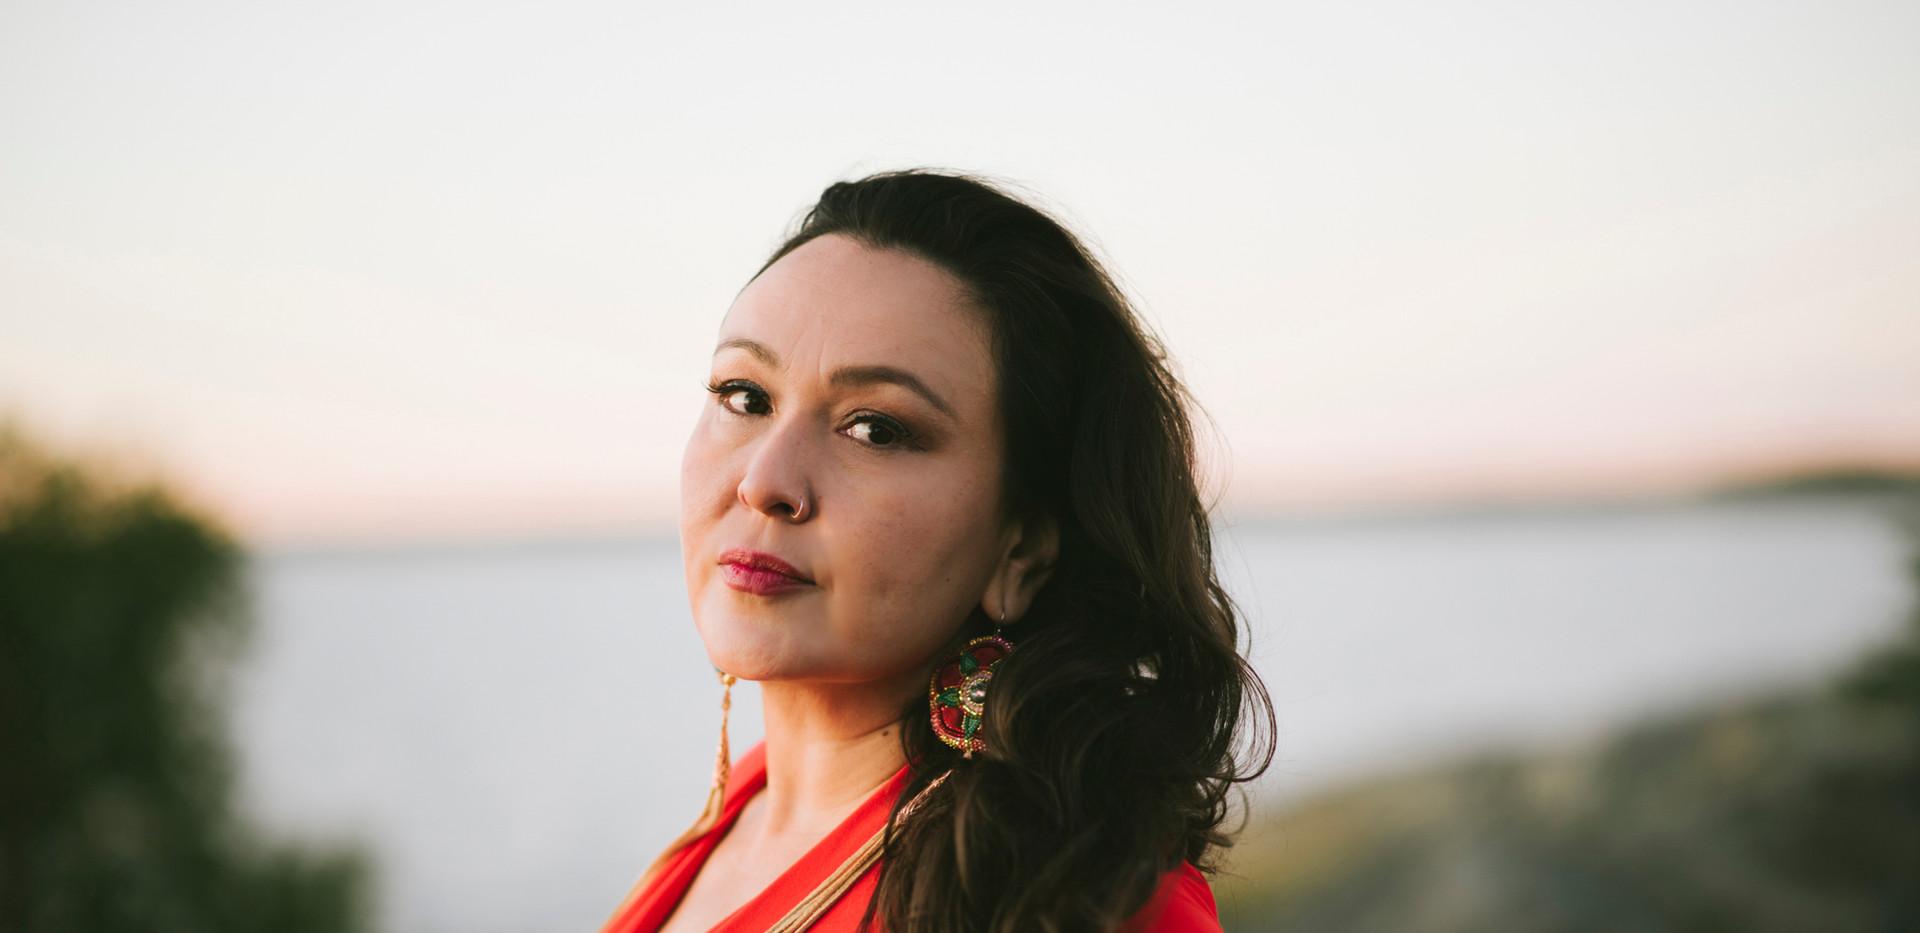 Leela Gilday - Red Dress Headshot